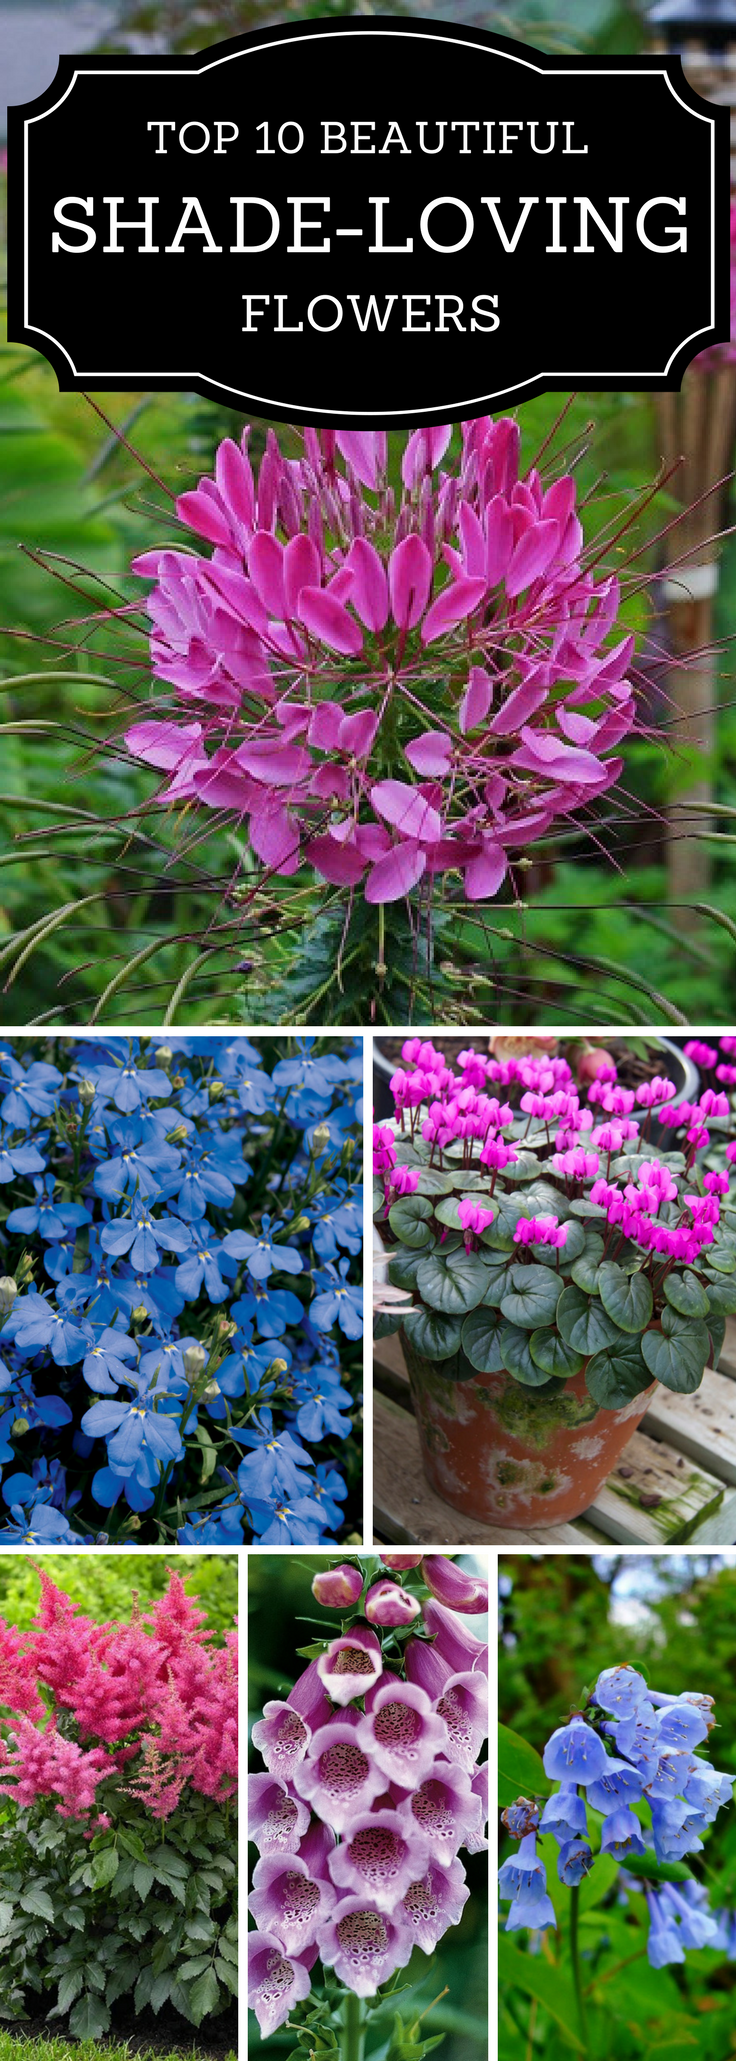 Top beautiful shade loving flowers drought tolerant plants